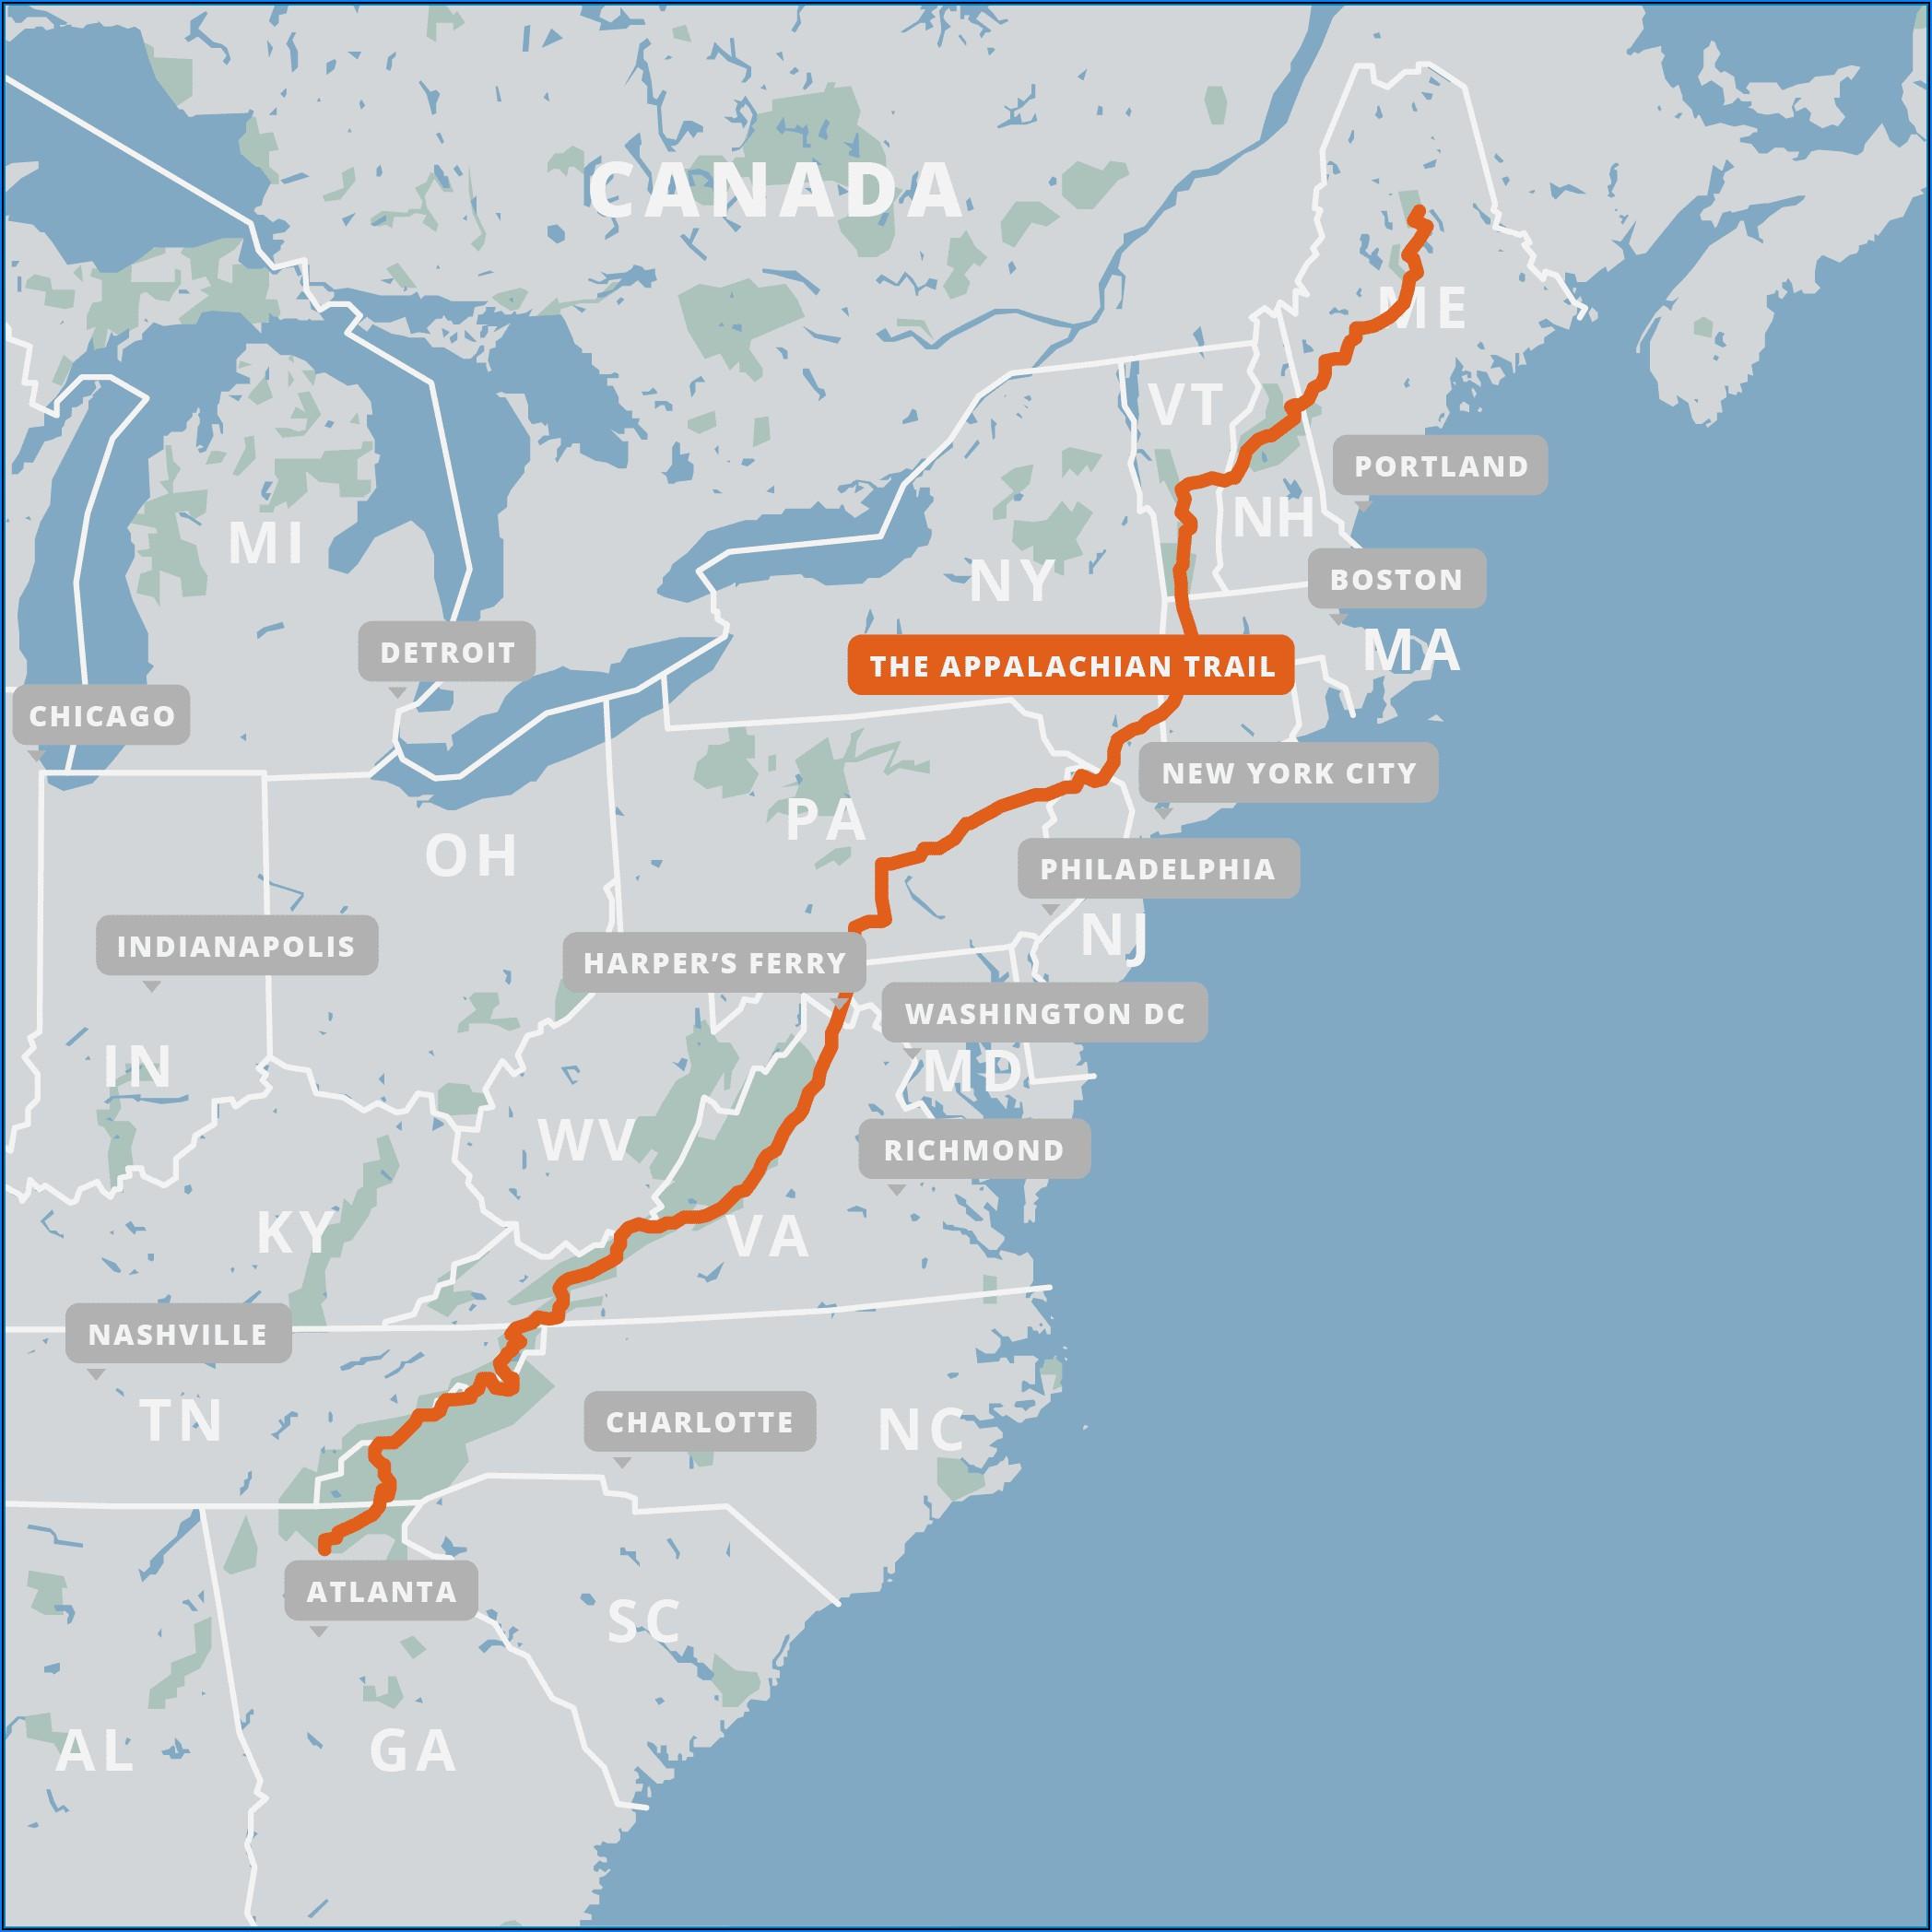 Appalachian Trail Maps For Sale